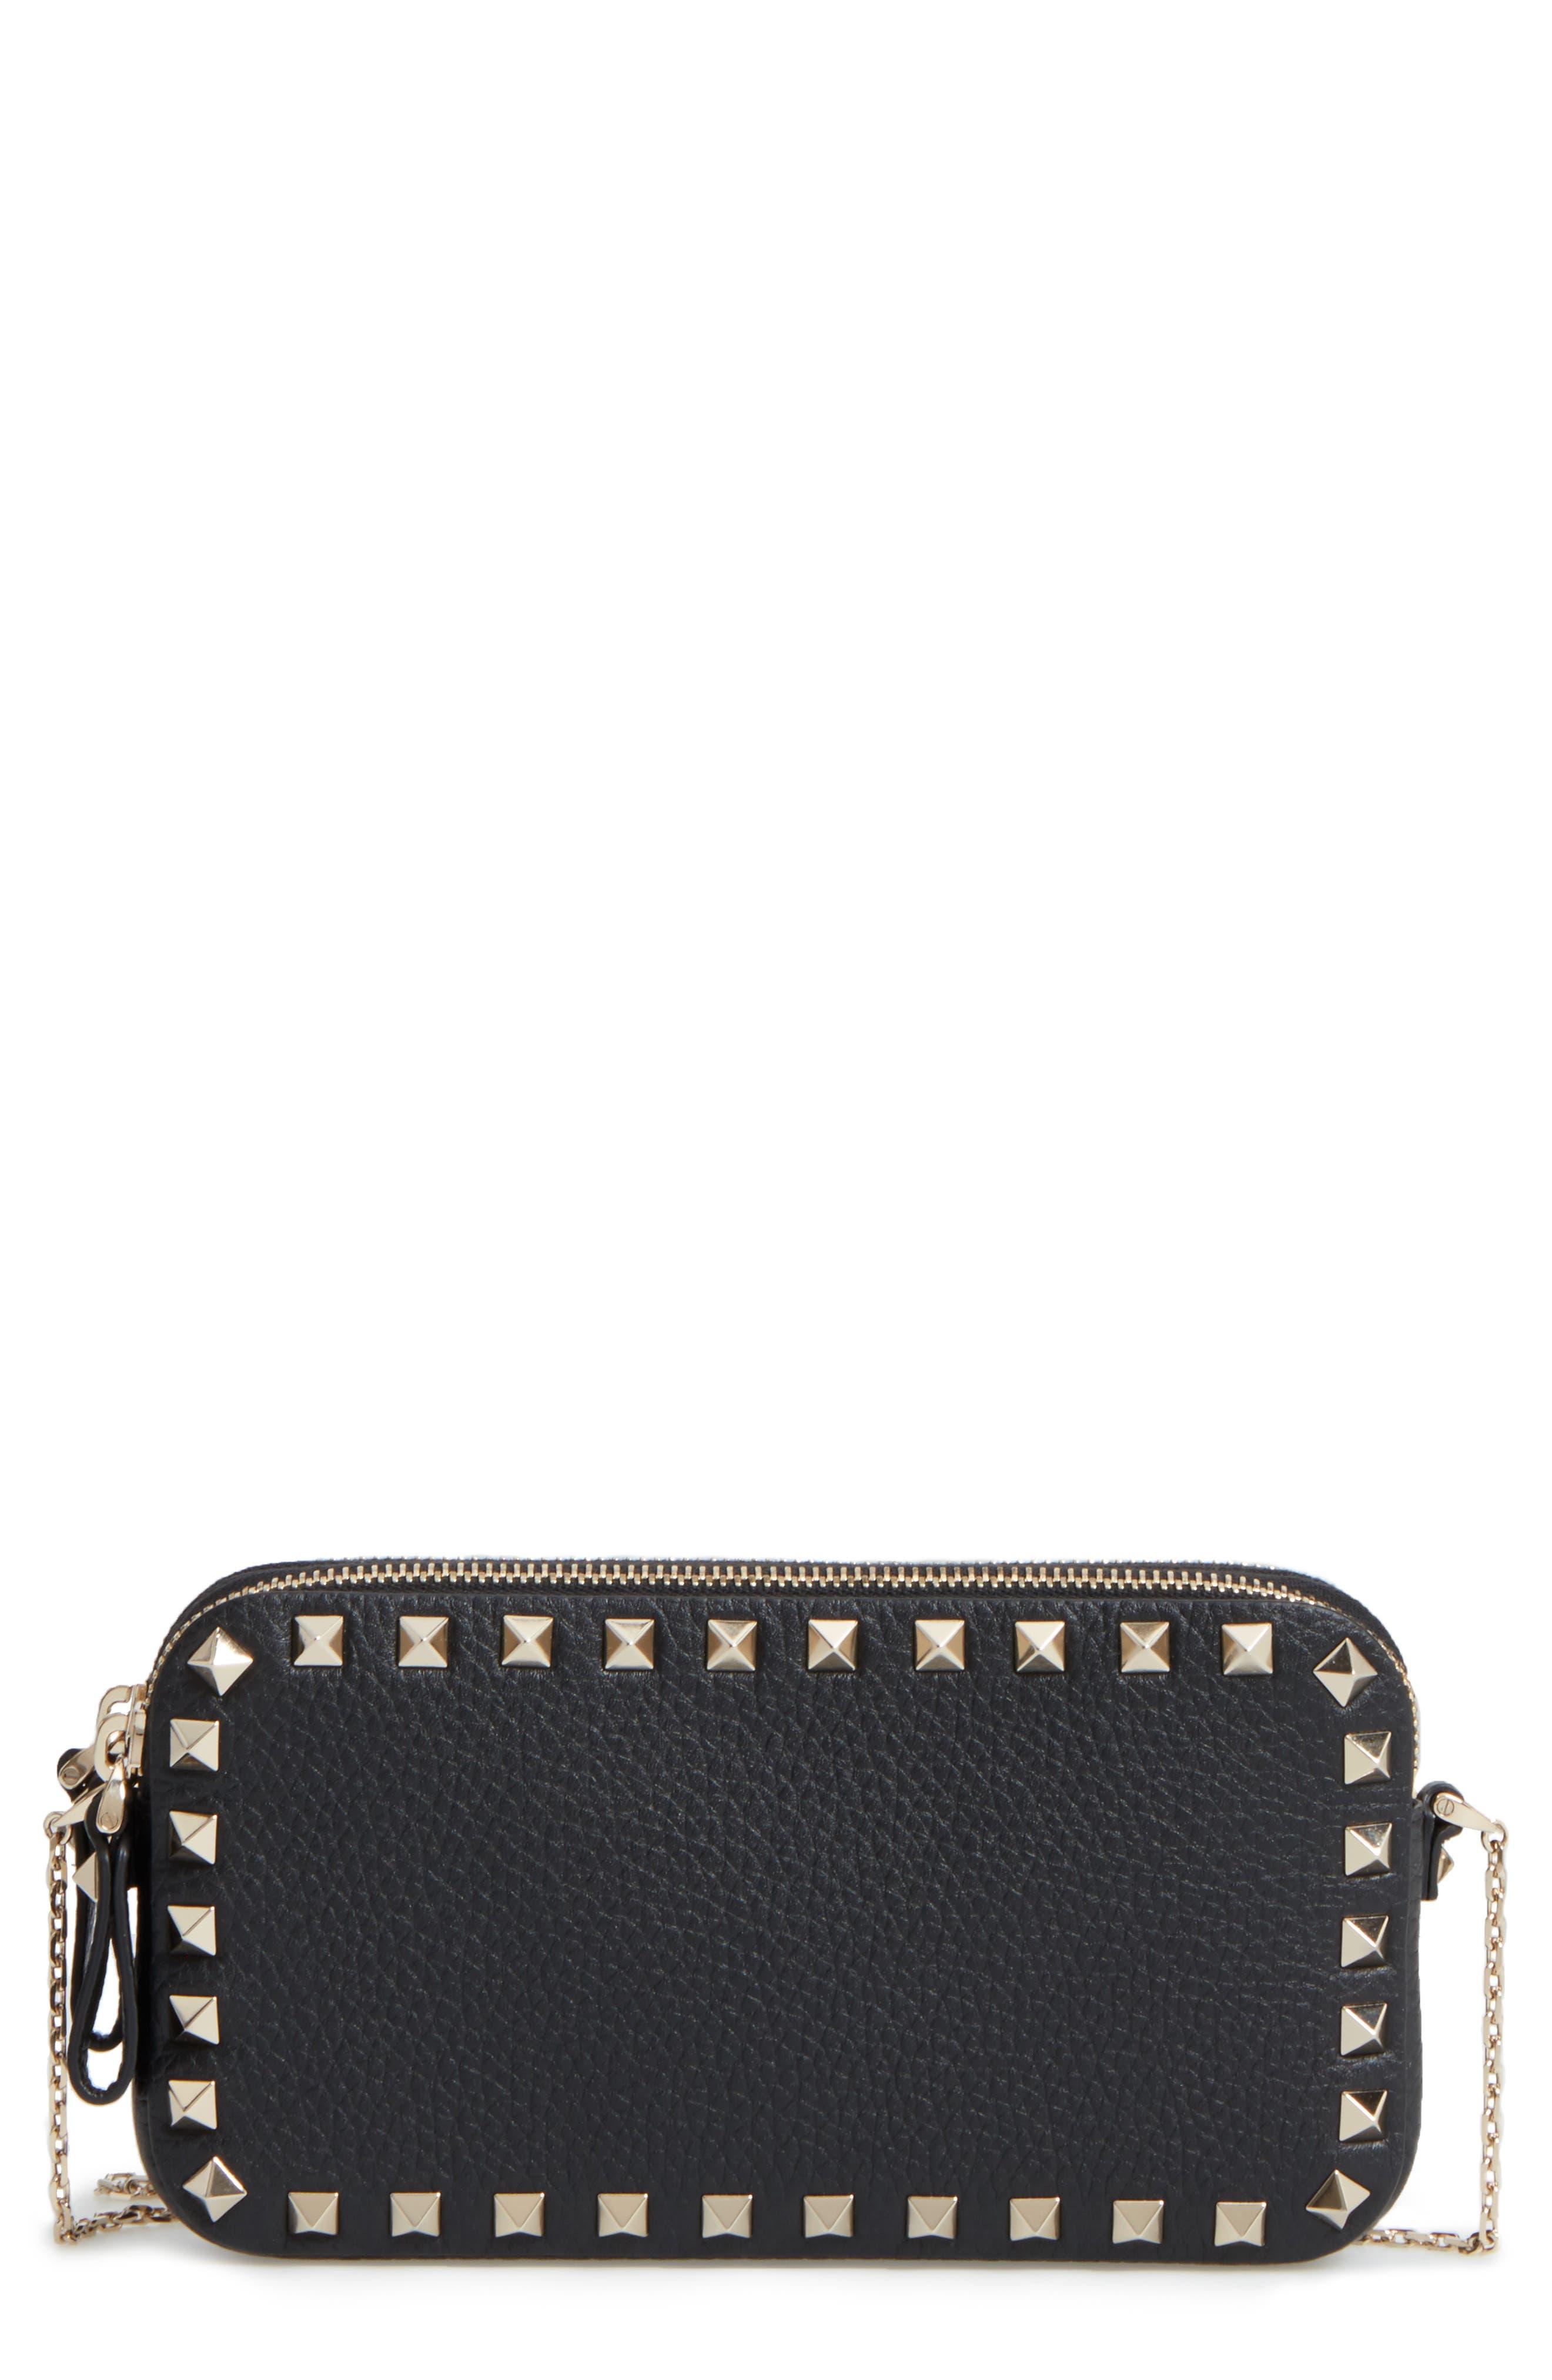 Main Image - VALENTINO GARAVANI Rockstud Leather Crossbody Bag